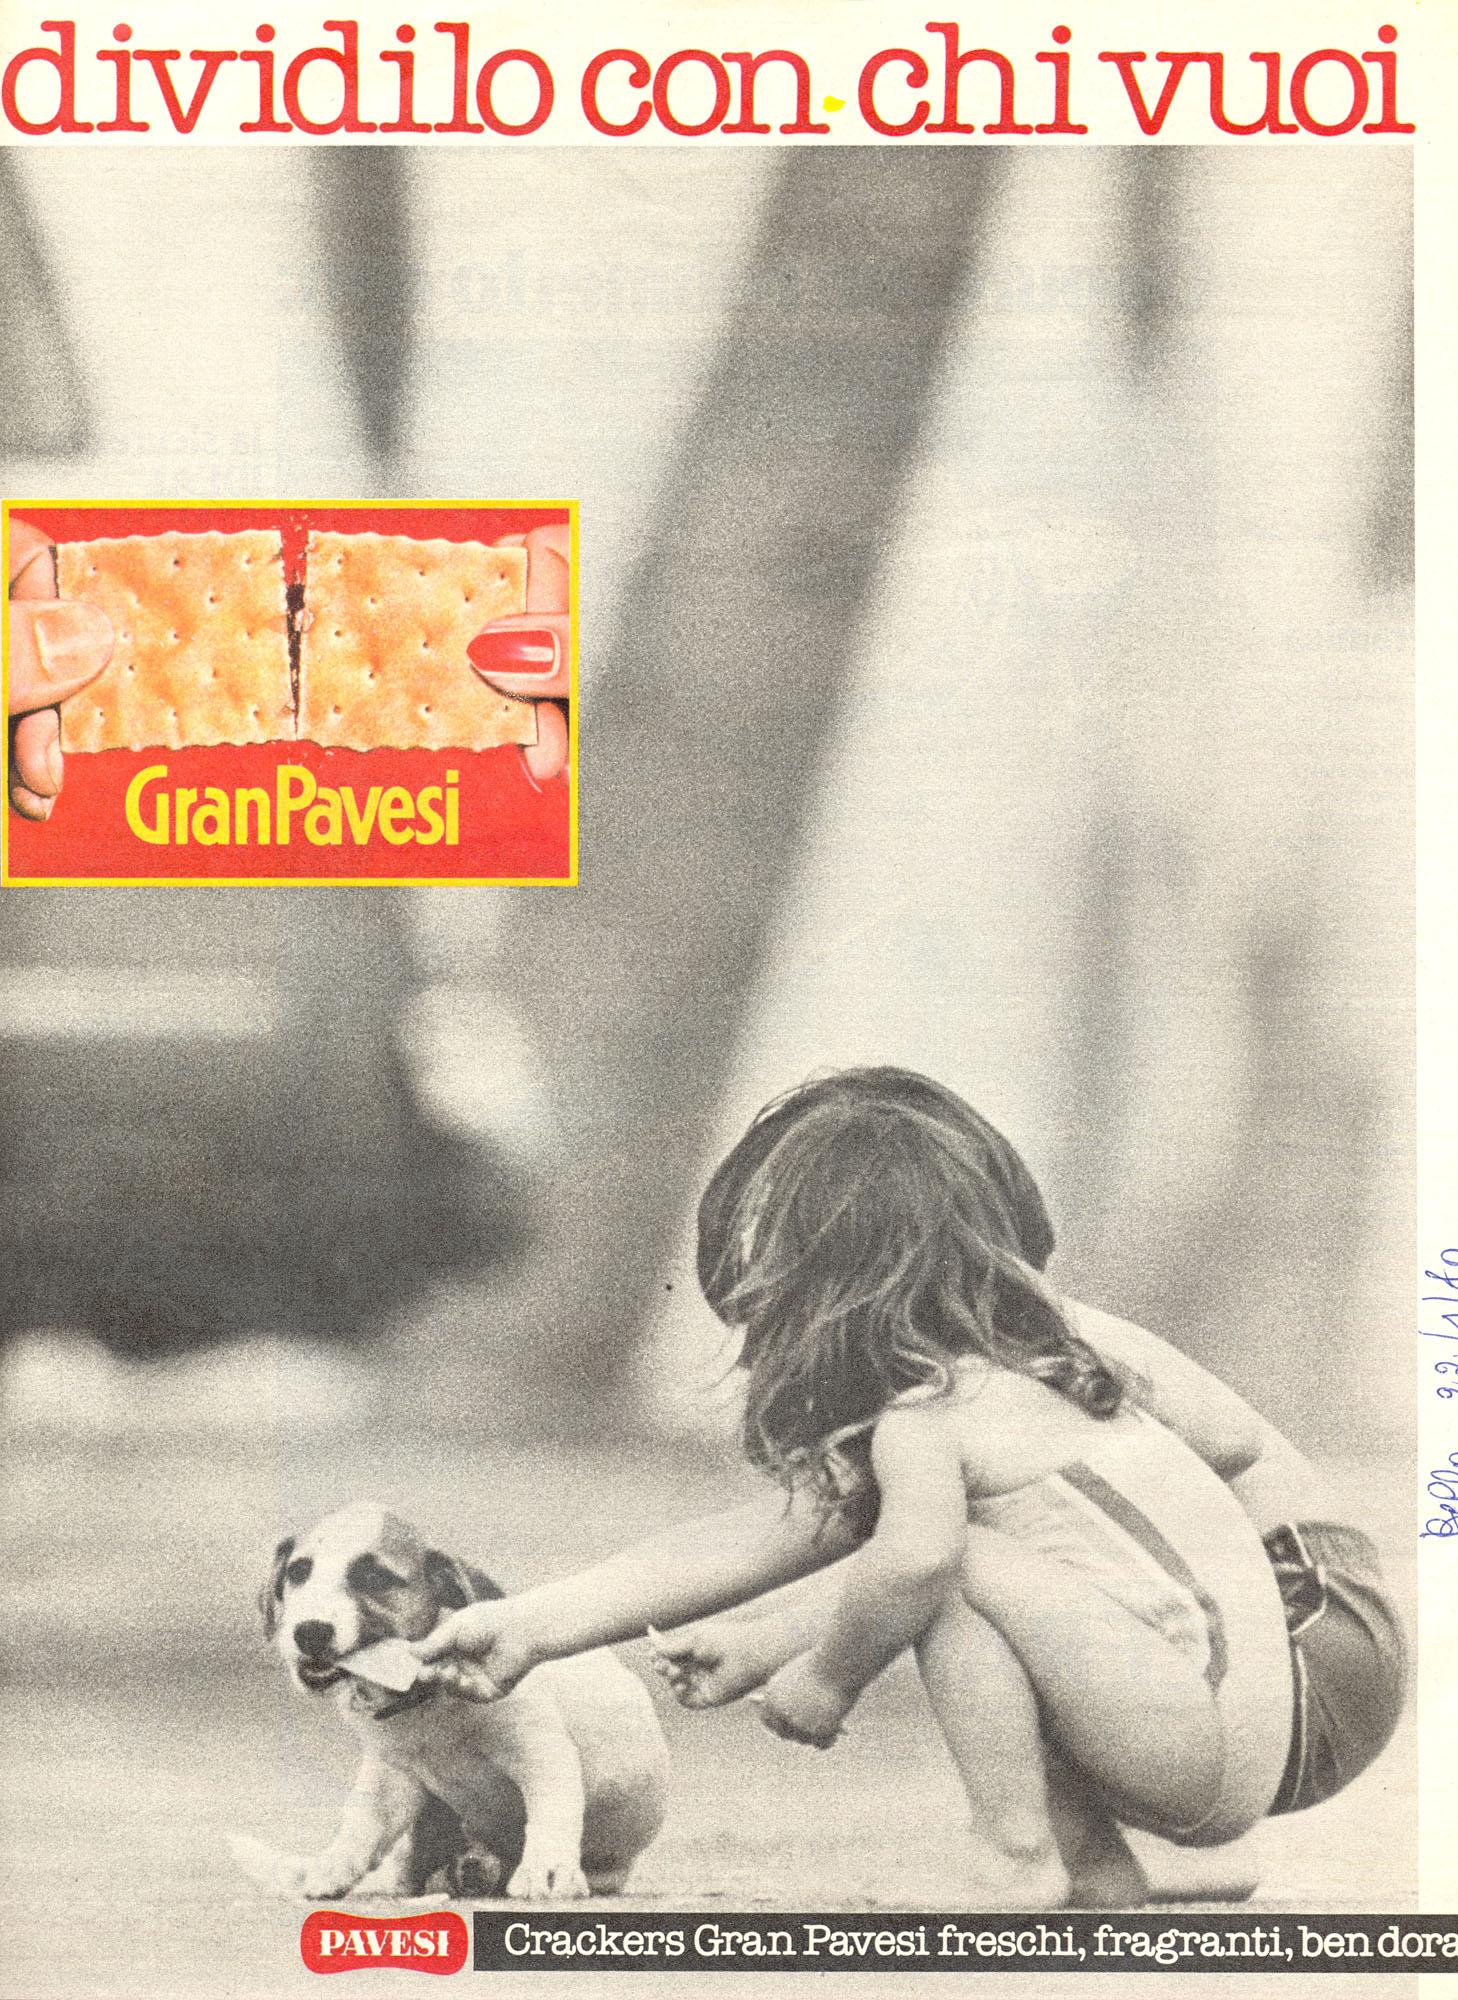 Press advertising Gran Pavesi Crackers, 1980